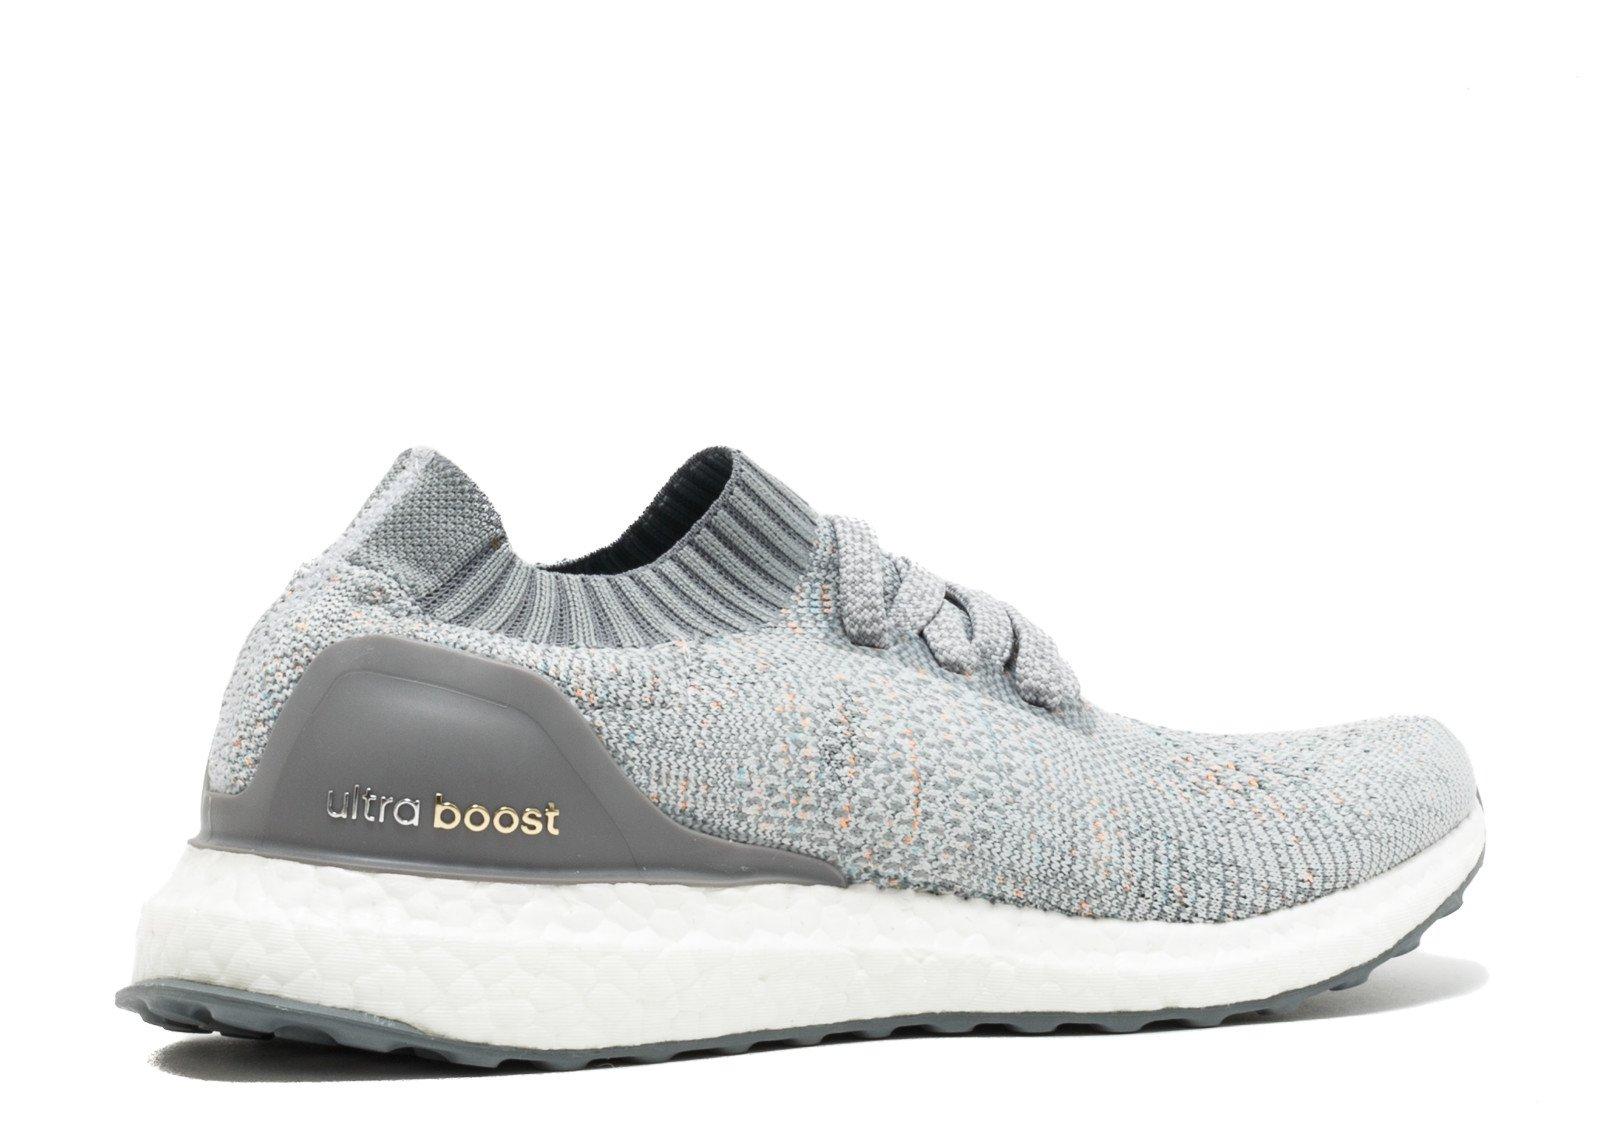 71fthZSt7nL - adidas Men's Ultraboost Uncaged Running Shoe (Grey)